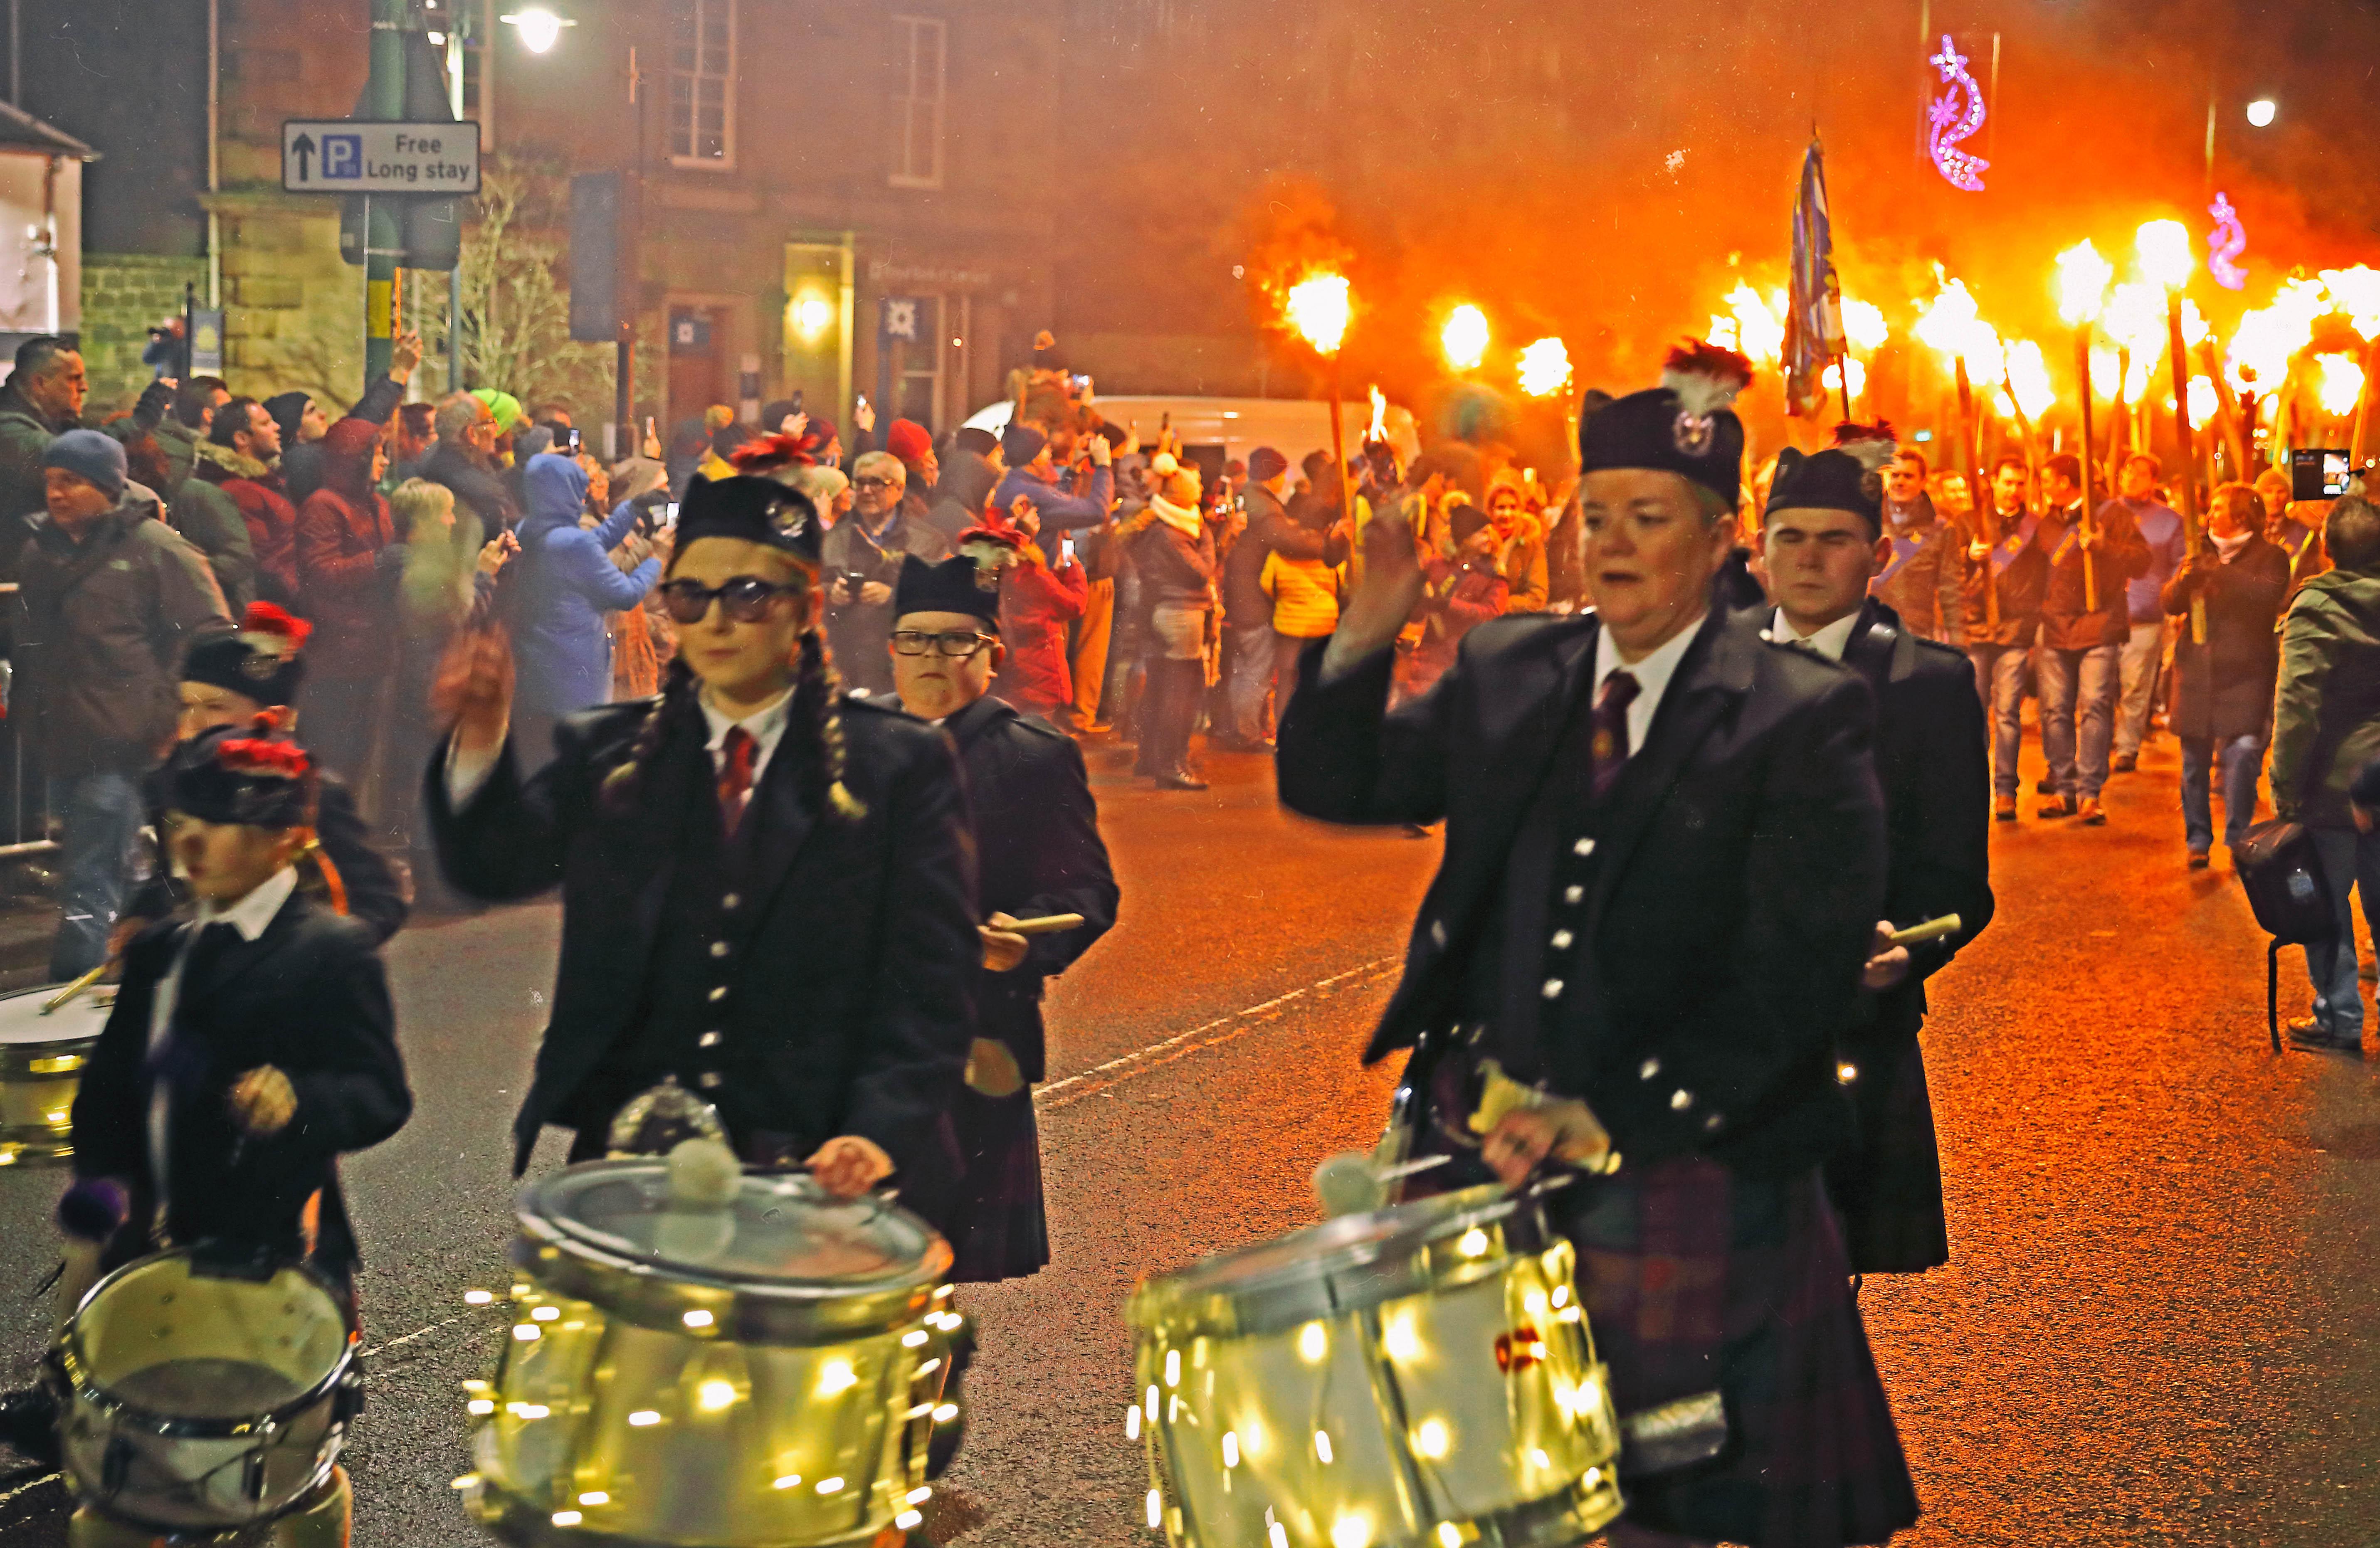 Biggar,Bonfire,fire,Borders,Scottish,scotland,UK,HousingITguy,Project365,2nd 365,HotpixUK365,Tone Smith,GoTonySmith,365,2365,one a day,Tony Smith,Hotpix,marching,pipers,lit,lighting